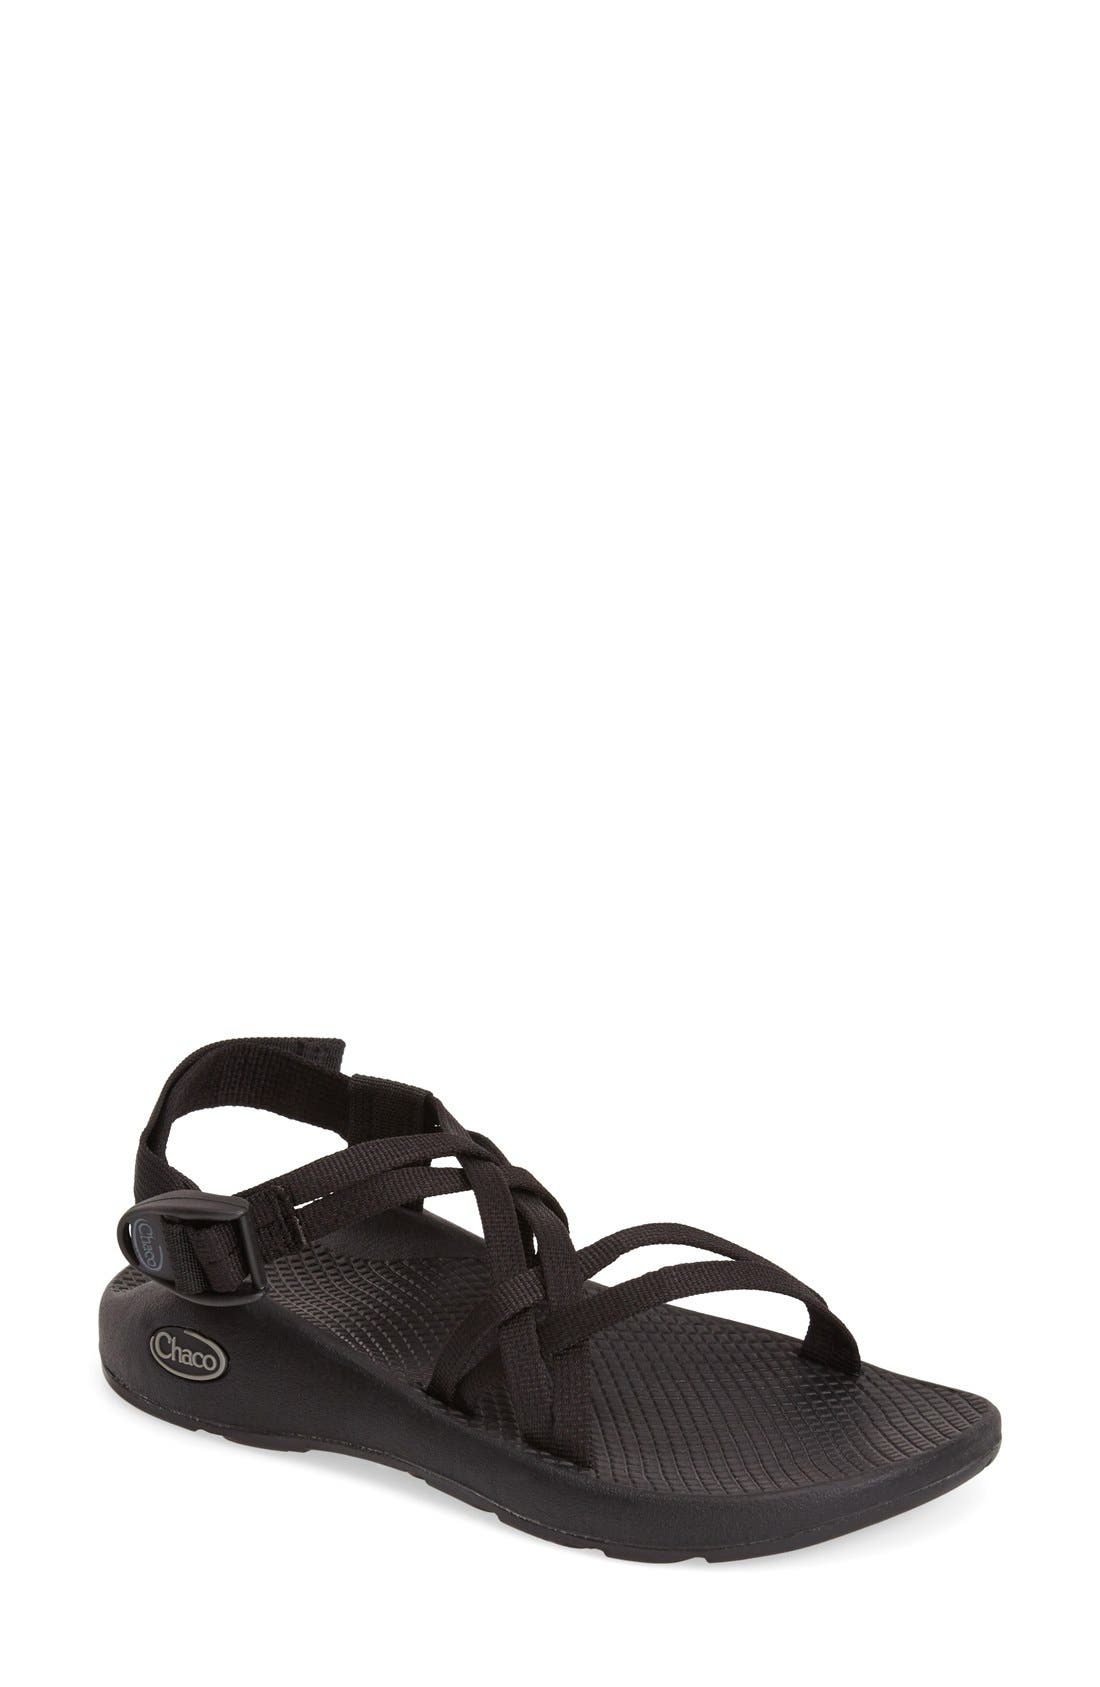 Main Image - Chaco 'ZX1 Yampa' Double Strap Sport Sandal (Women)